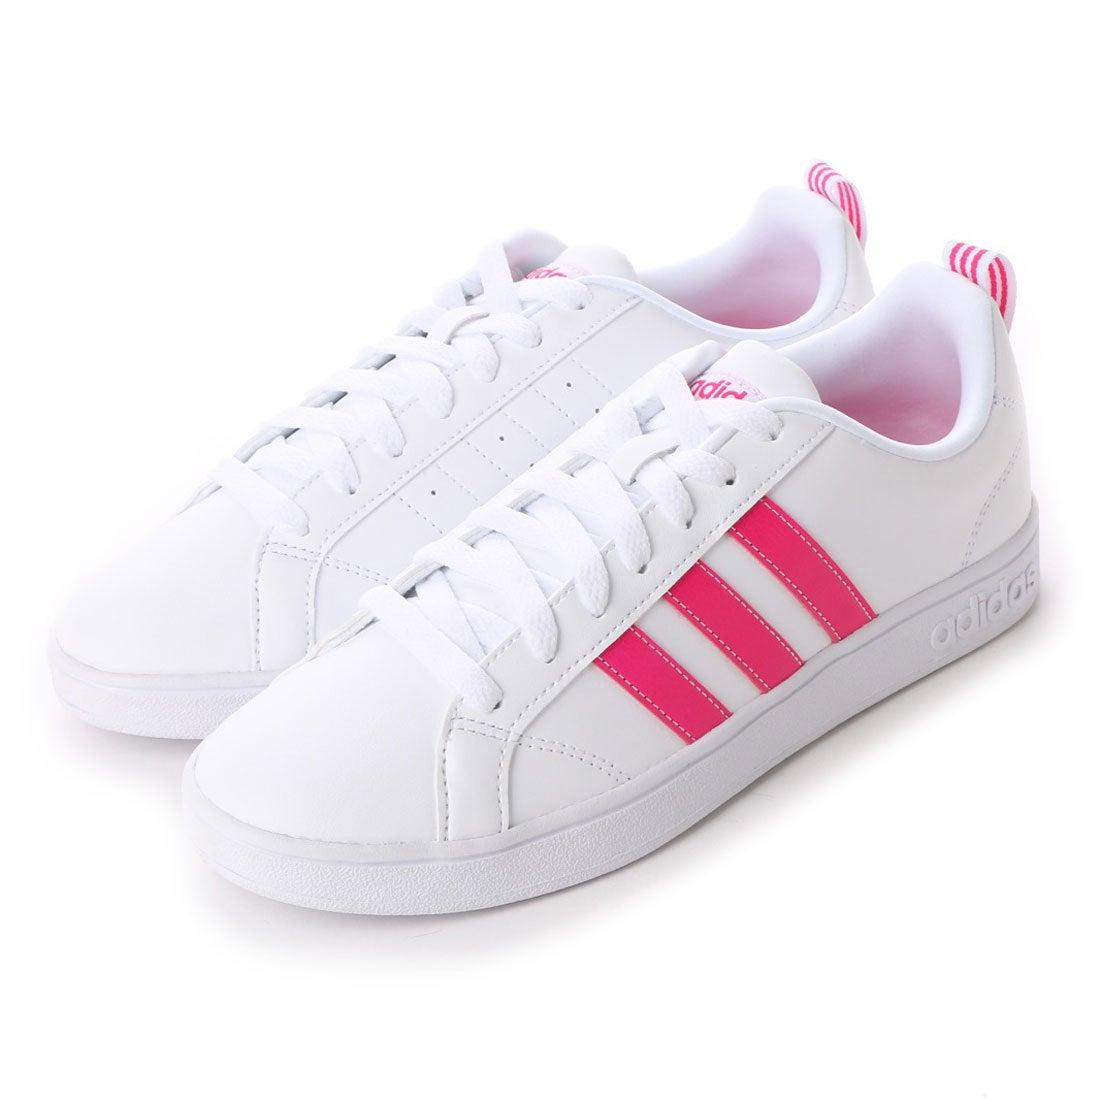 adidas レディース スニーカー ピンク